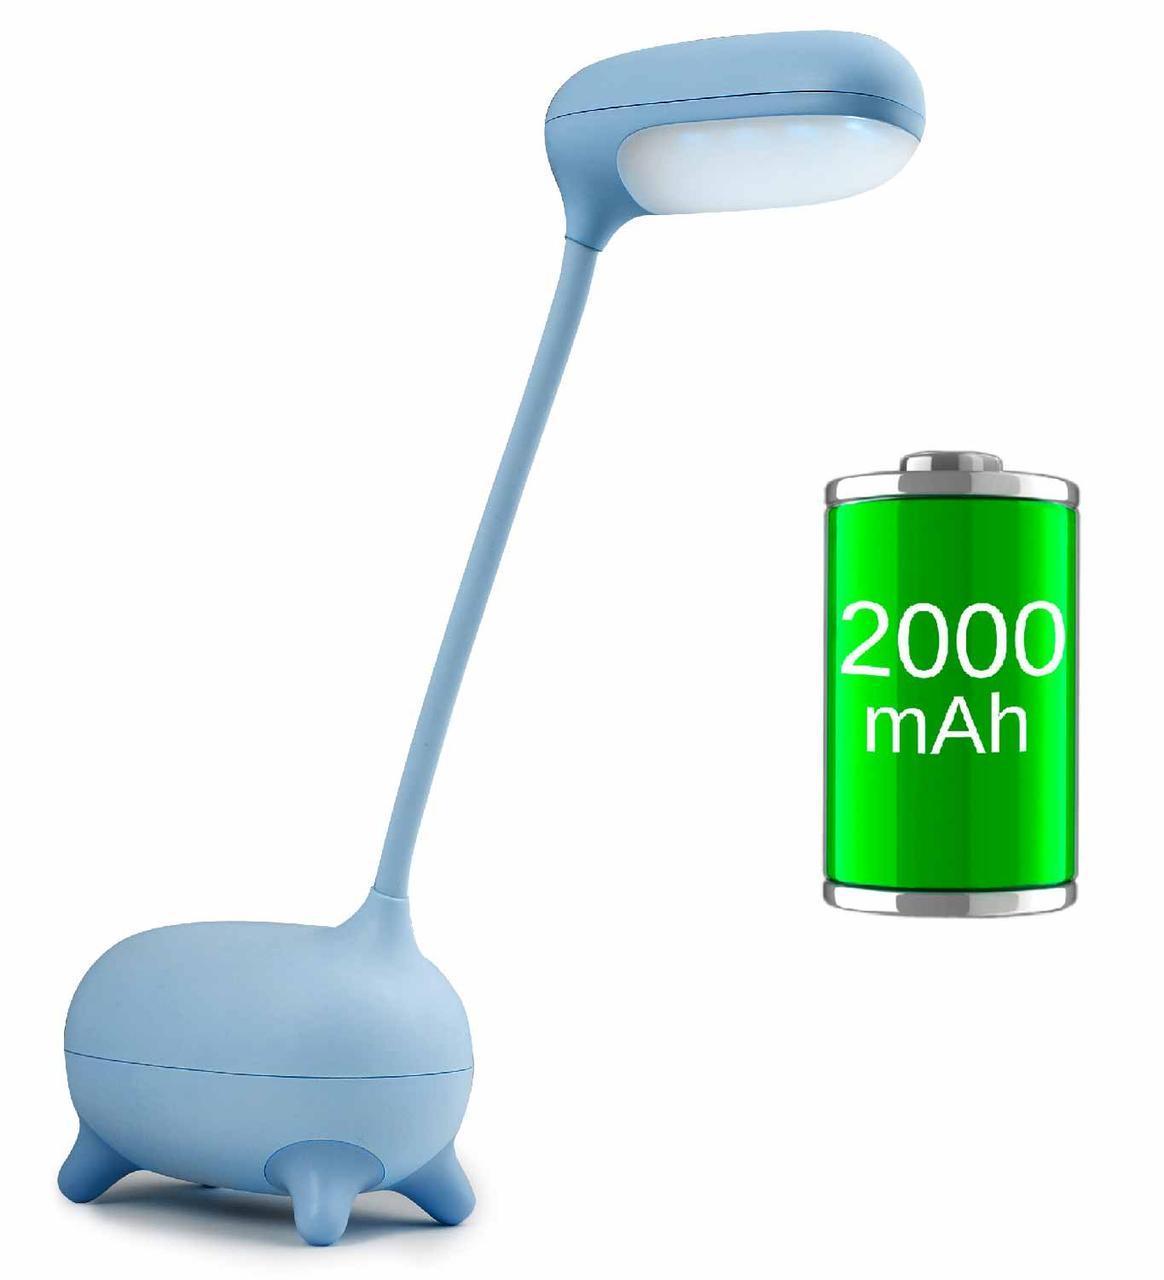 Дитяча настільна LED лампа NOUS S4 Blue 4W 2700-6500K з акумулятором